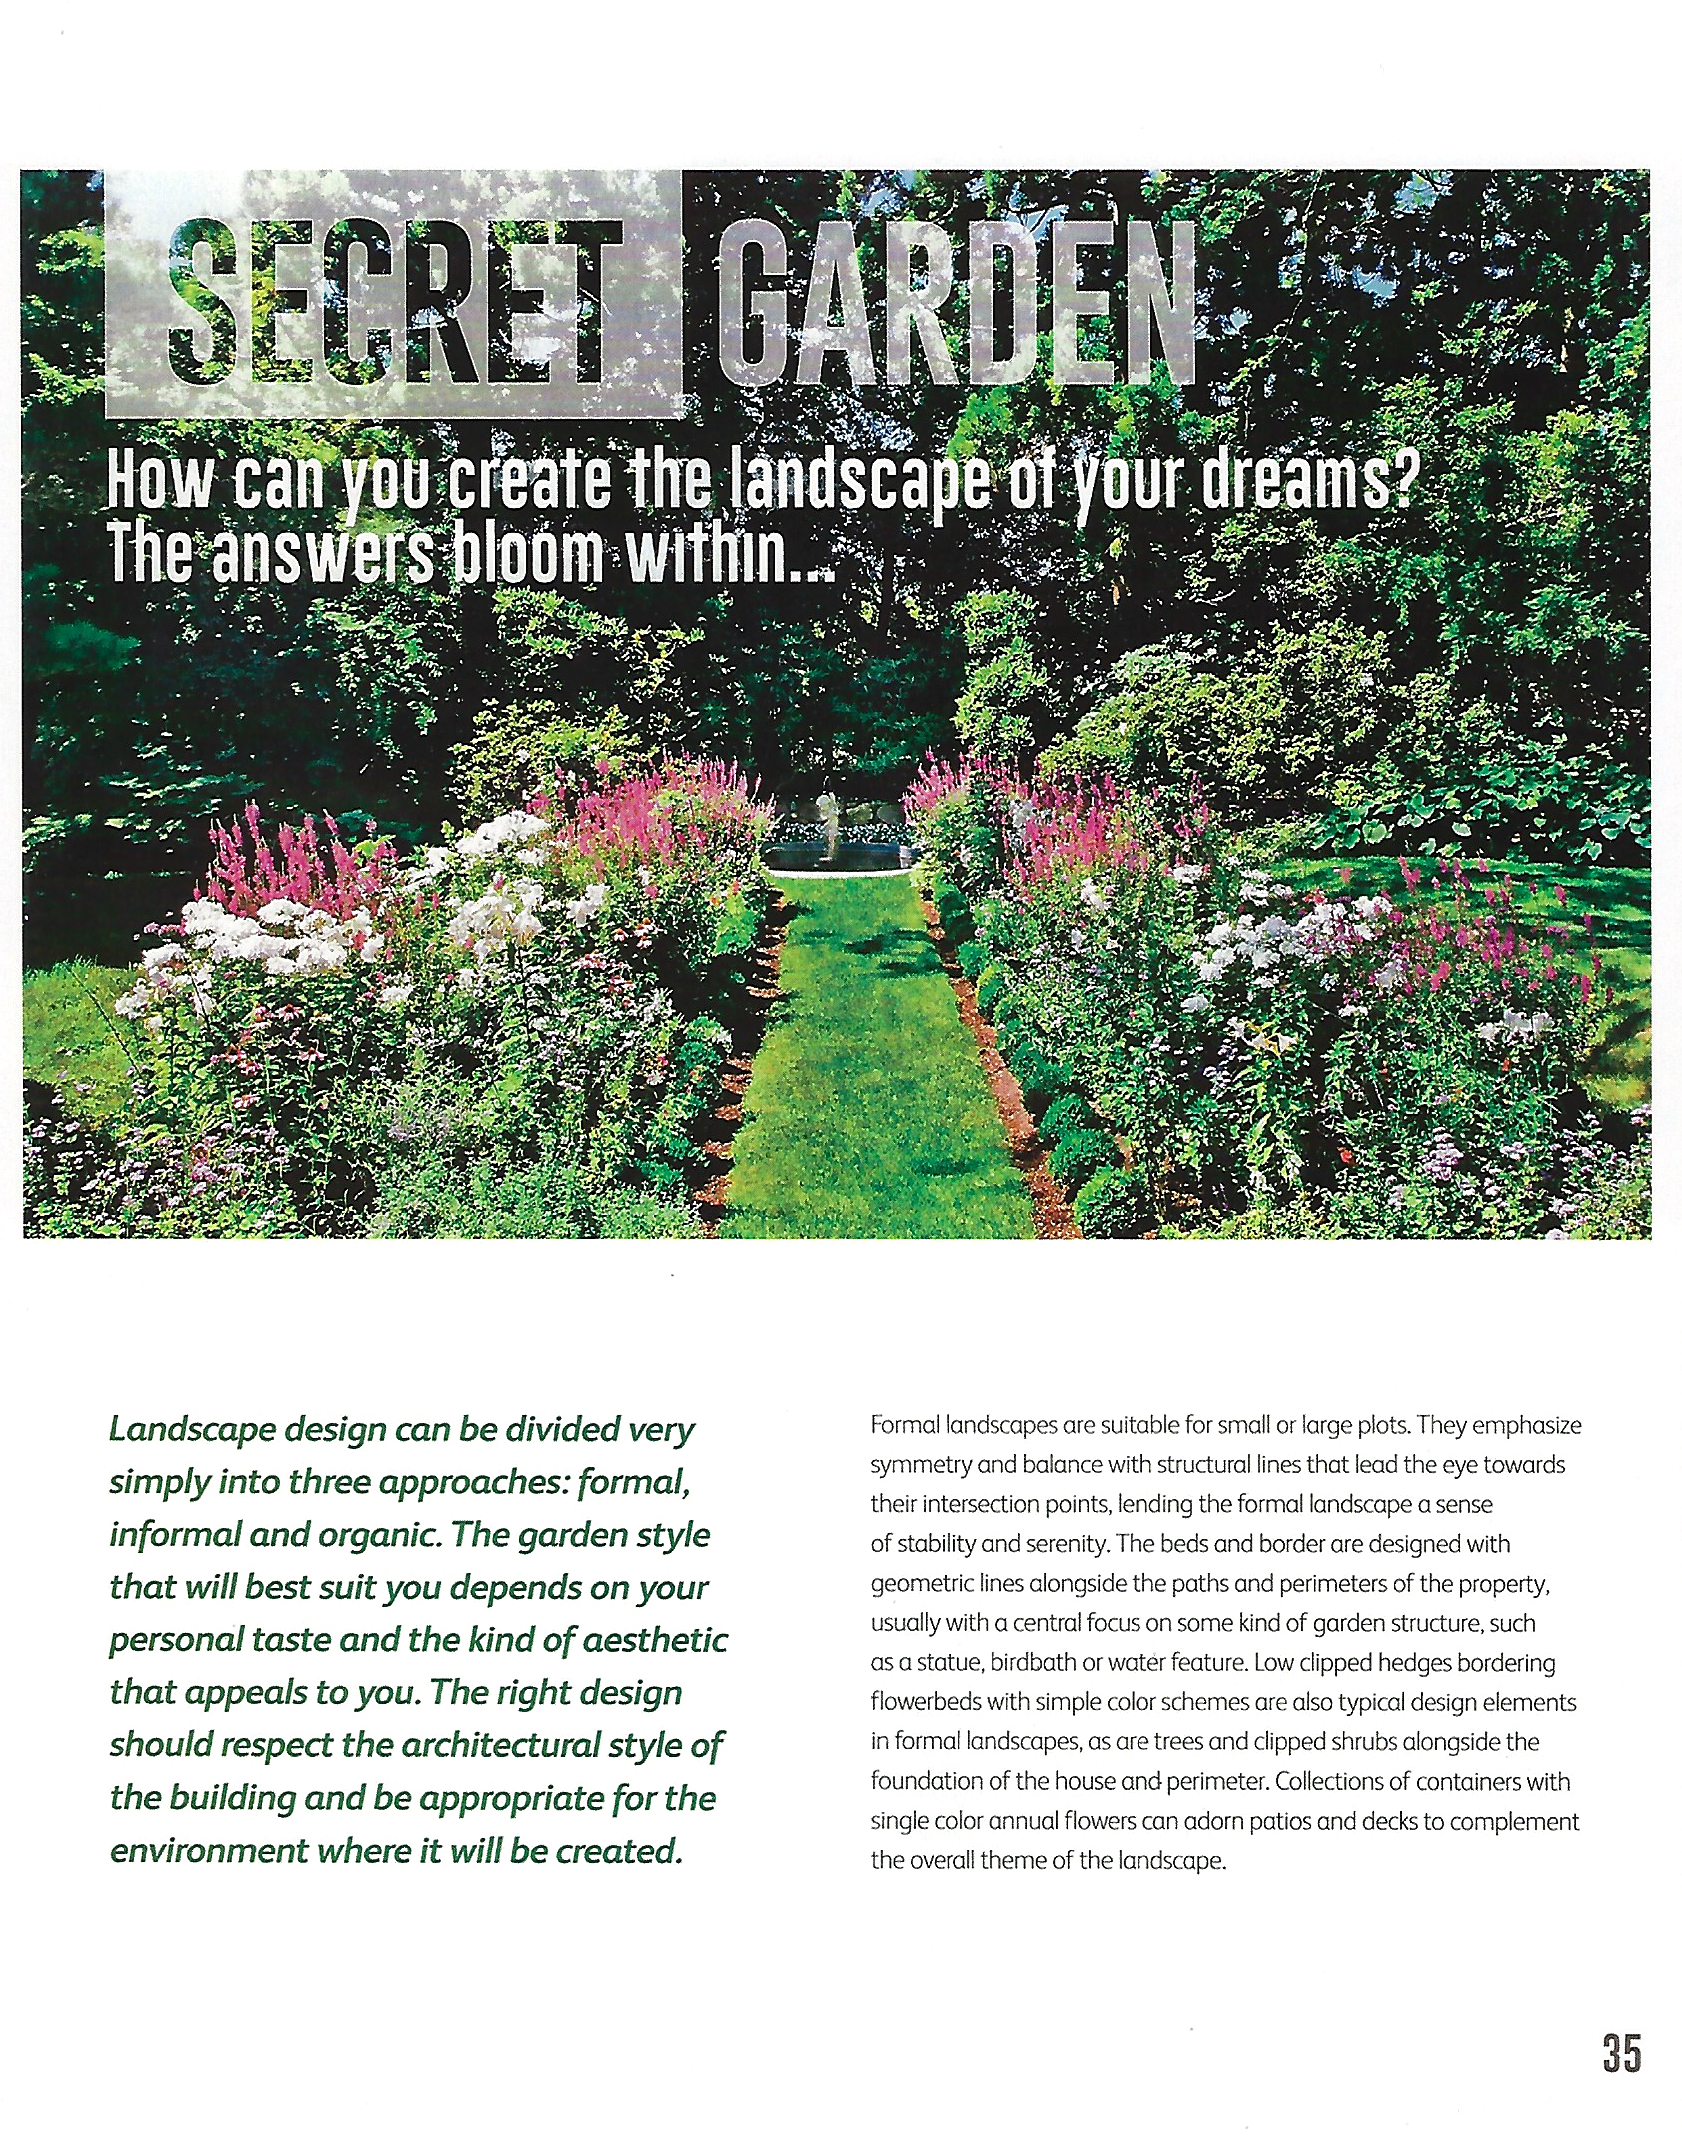 Behind the Hedges - Secret Garden_May 2017.jpg